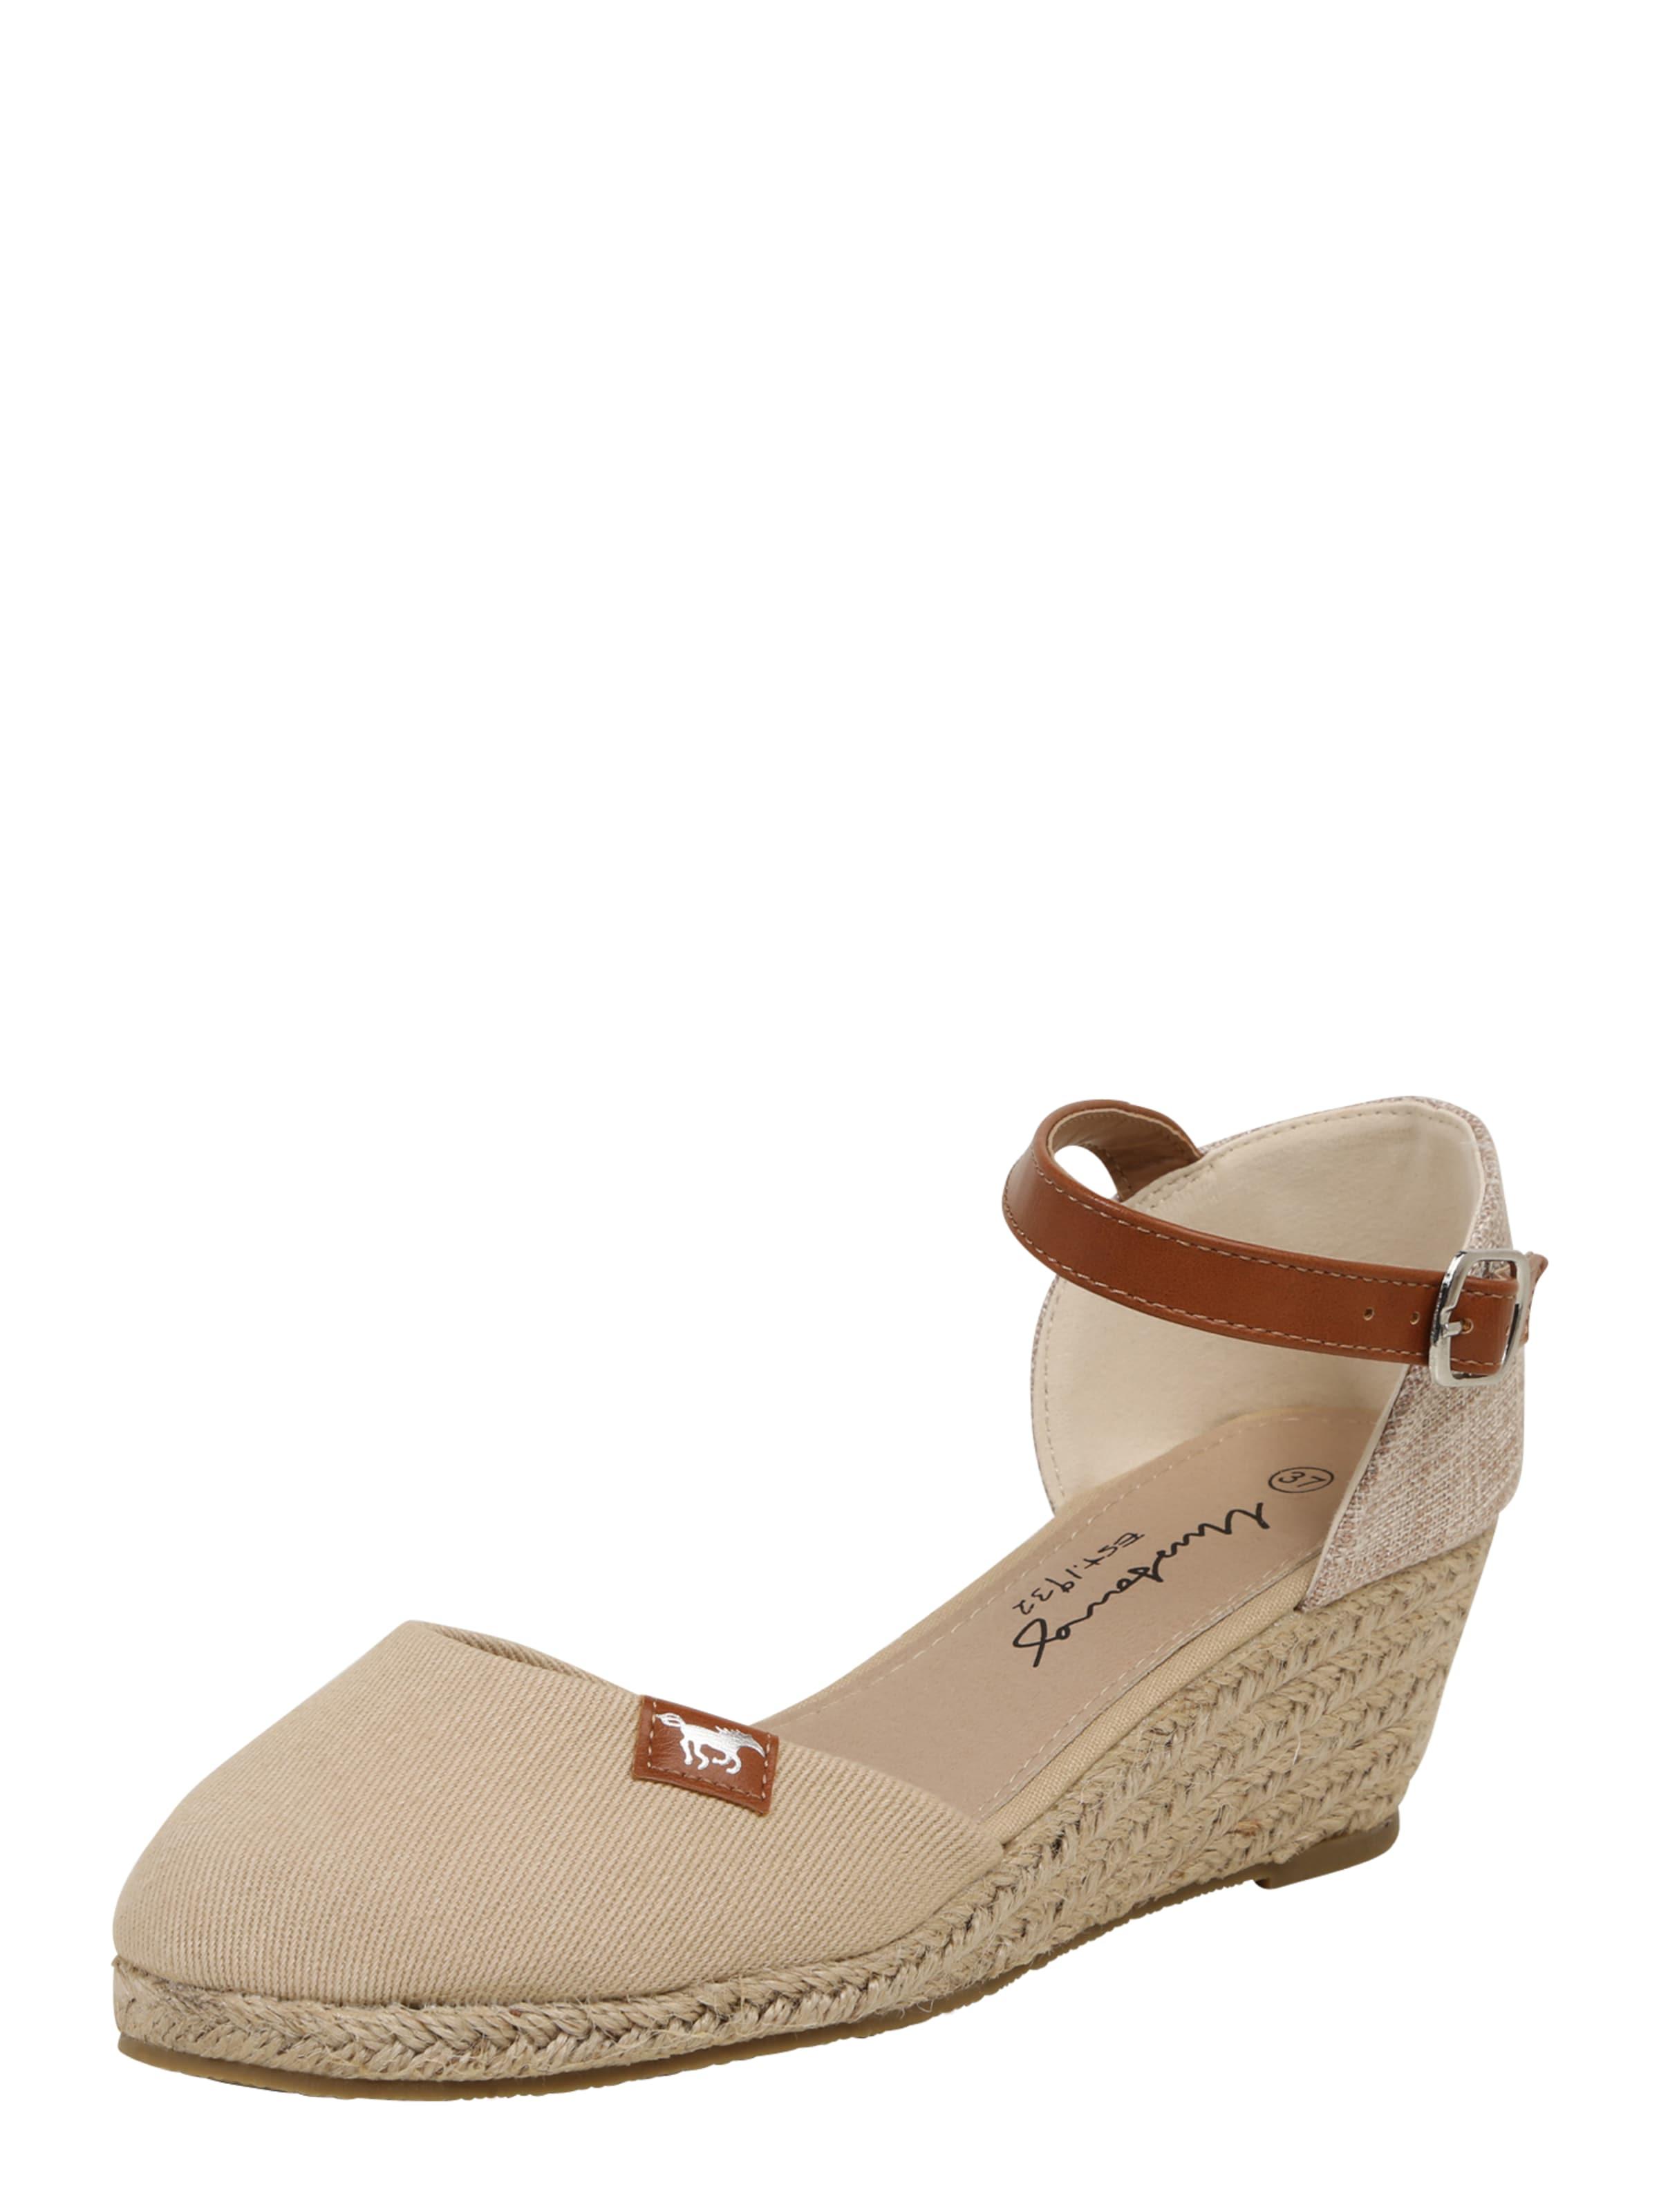 MUSTANG Keilsandalette Günstige und langlebige Schuhe